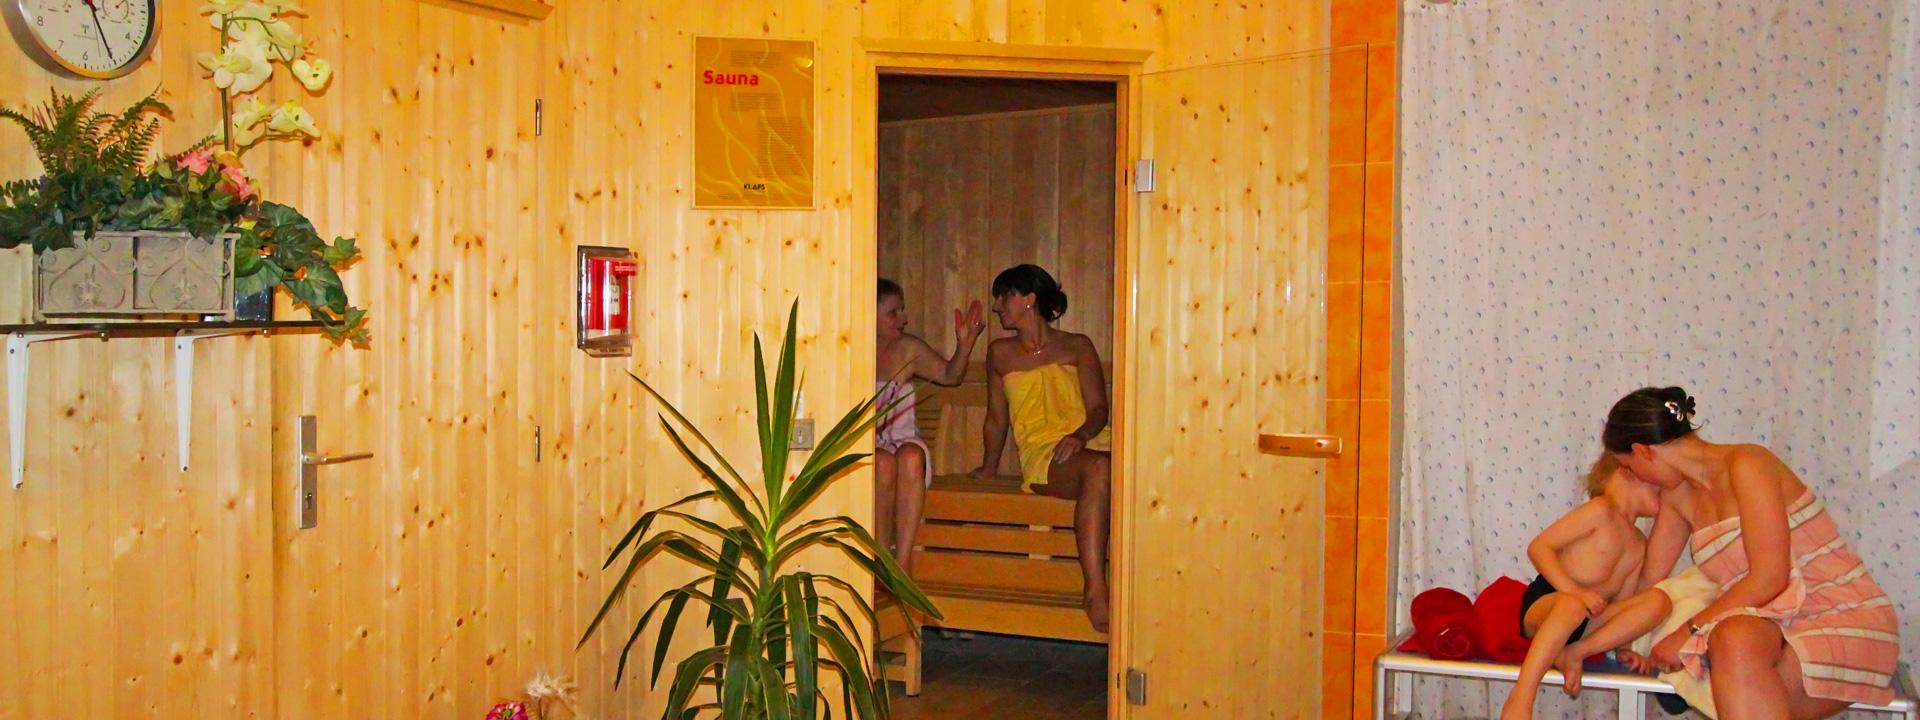 Sauna im Strandhotel Aseleben